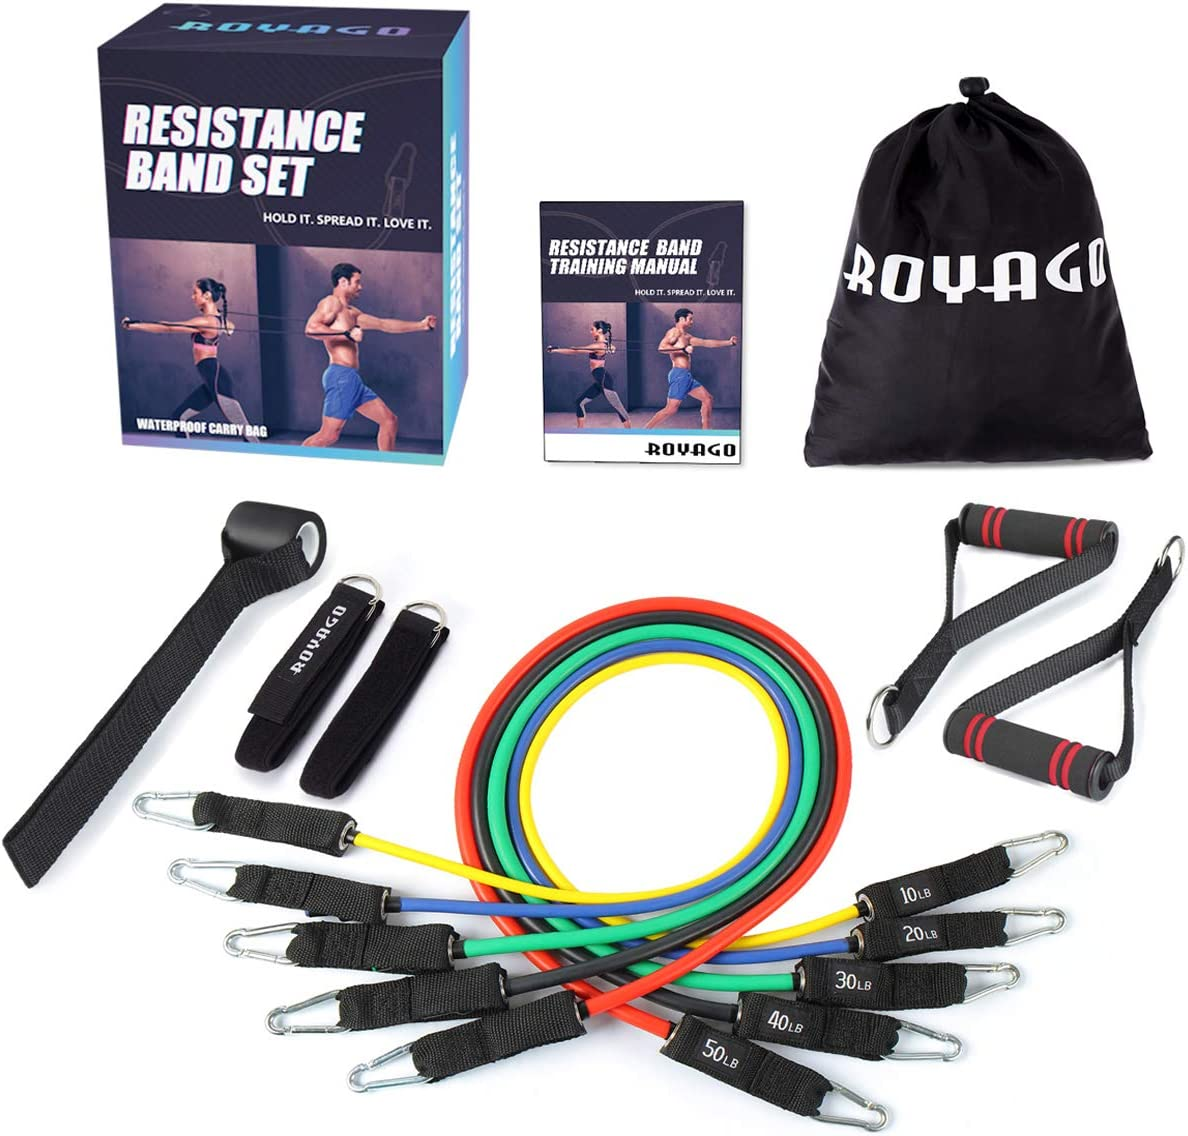 6er Set Mini Band Fitness Band Gymnastics Band Loops Bands Rubber Resistance Band